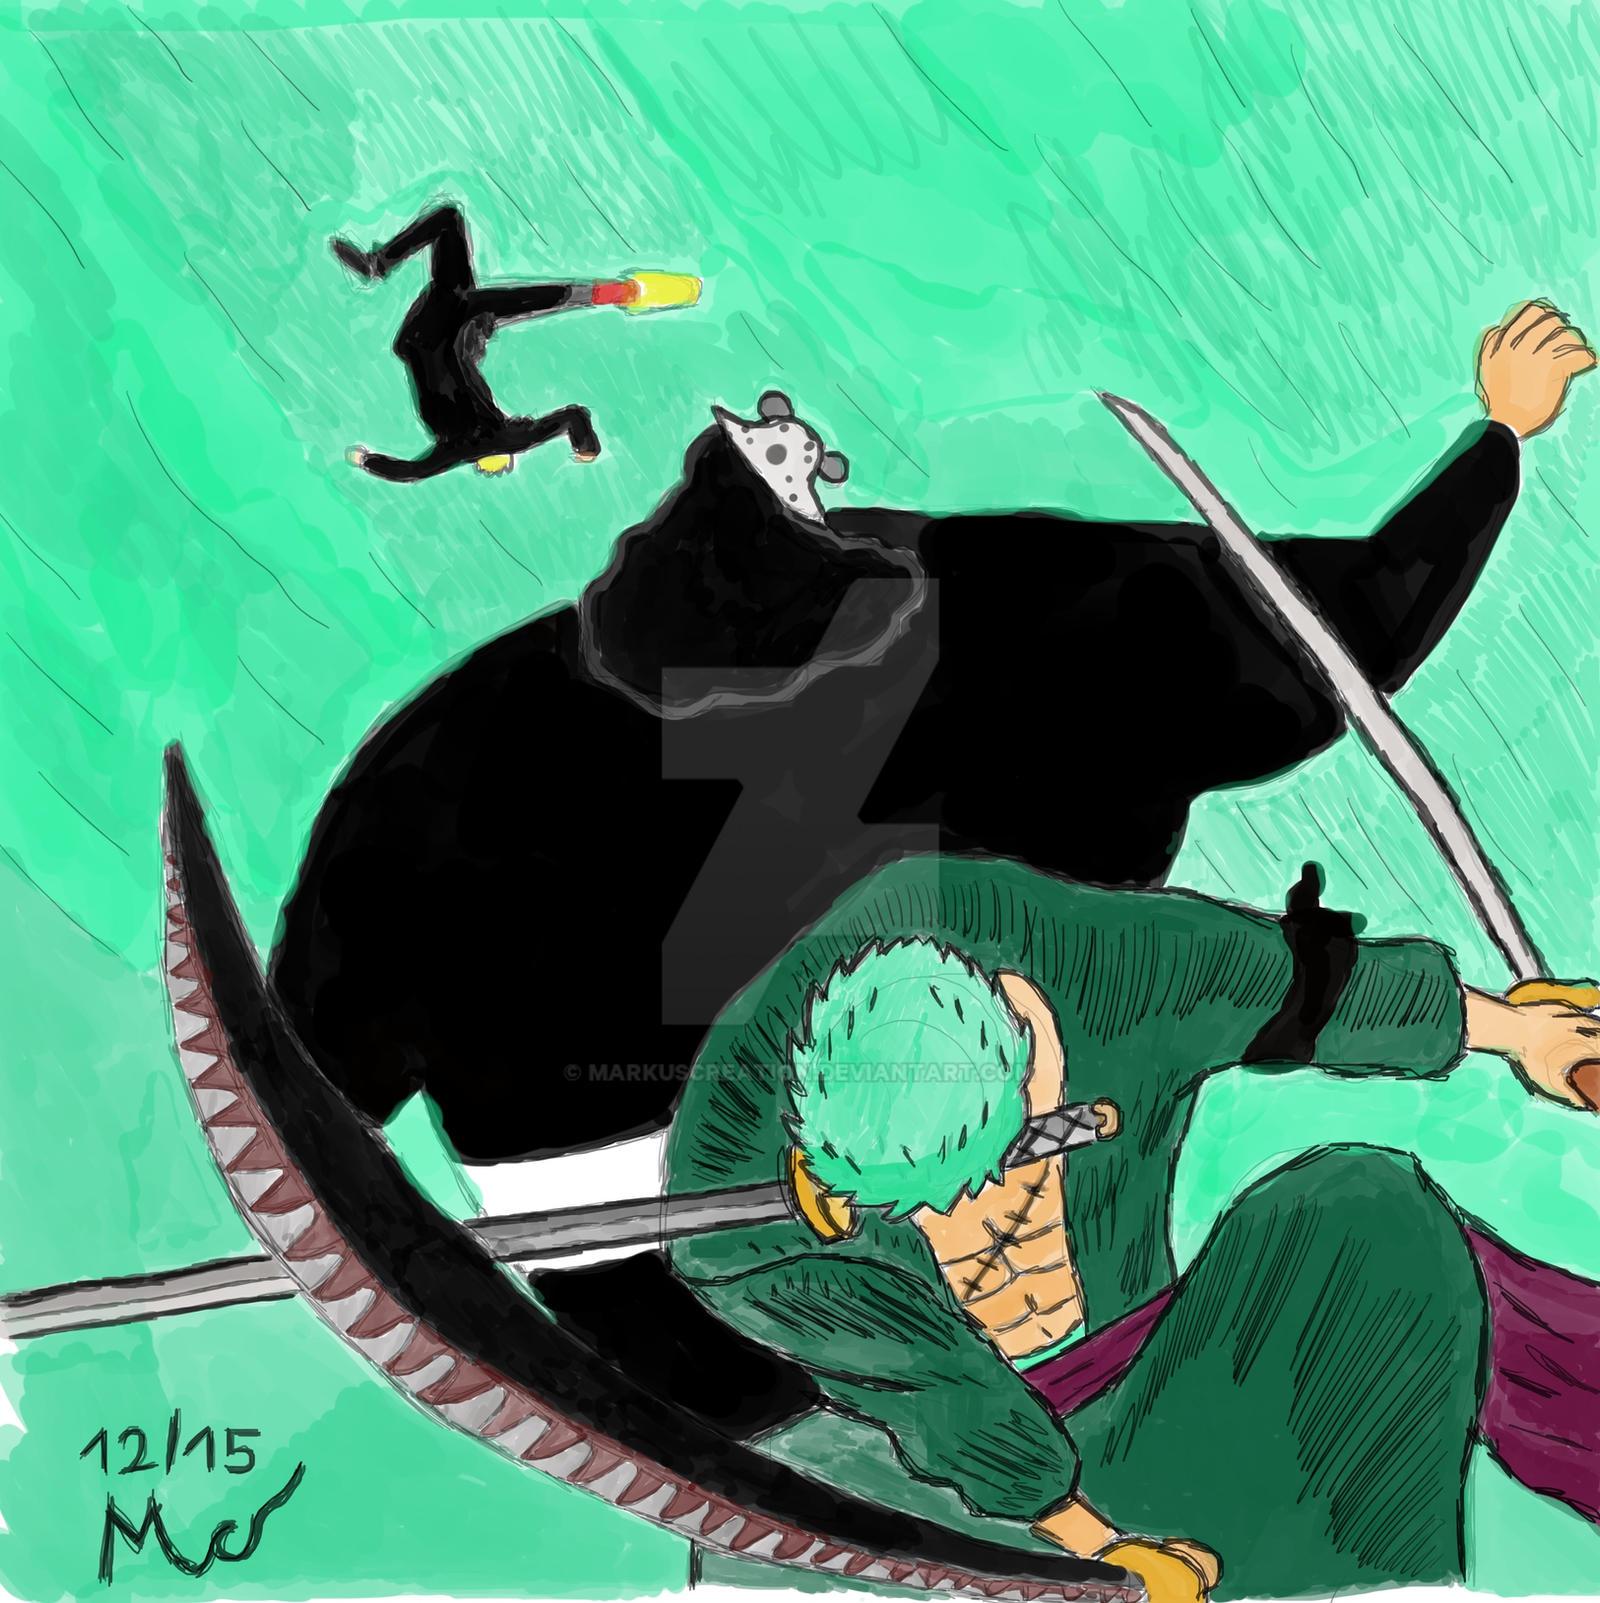 One Piece Fanart Zoro Sanji Vs Pacifista Kuma By Markuscreation On Deviantart